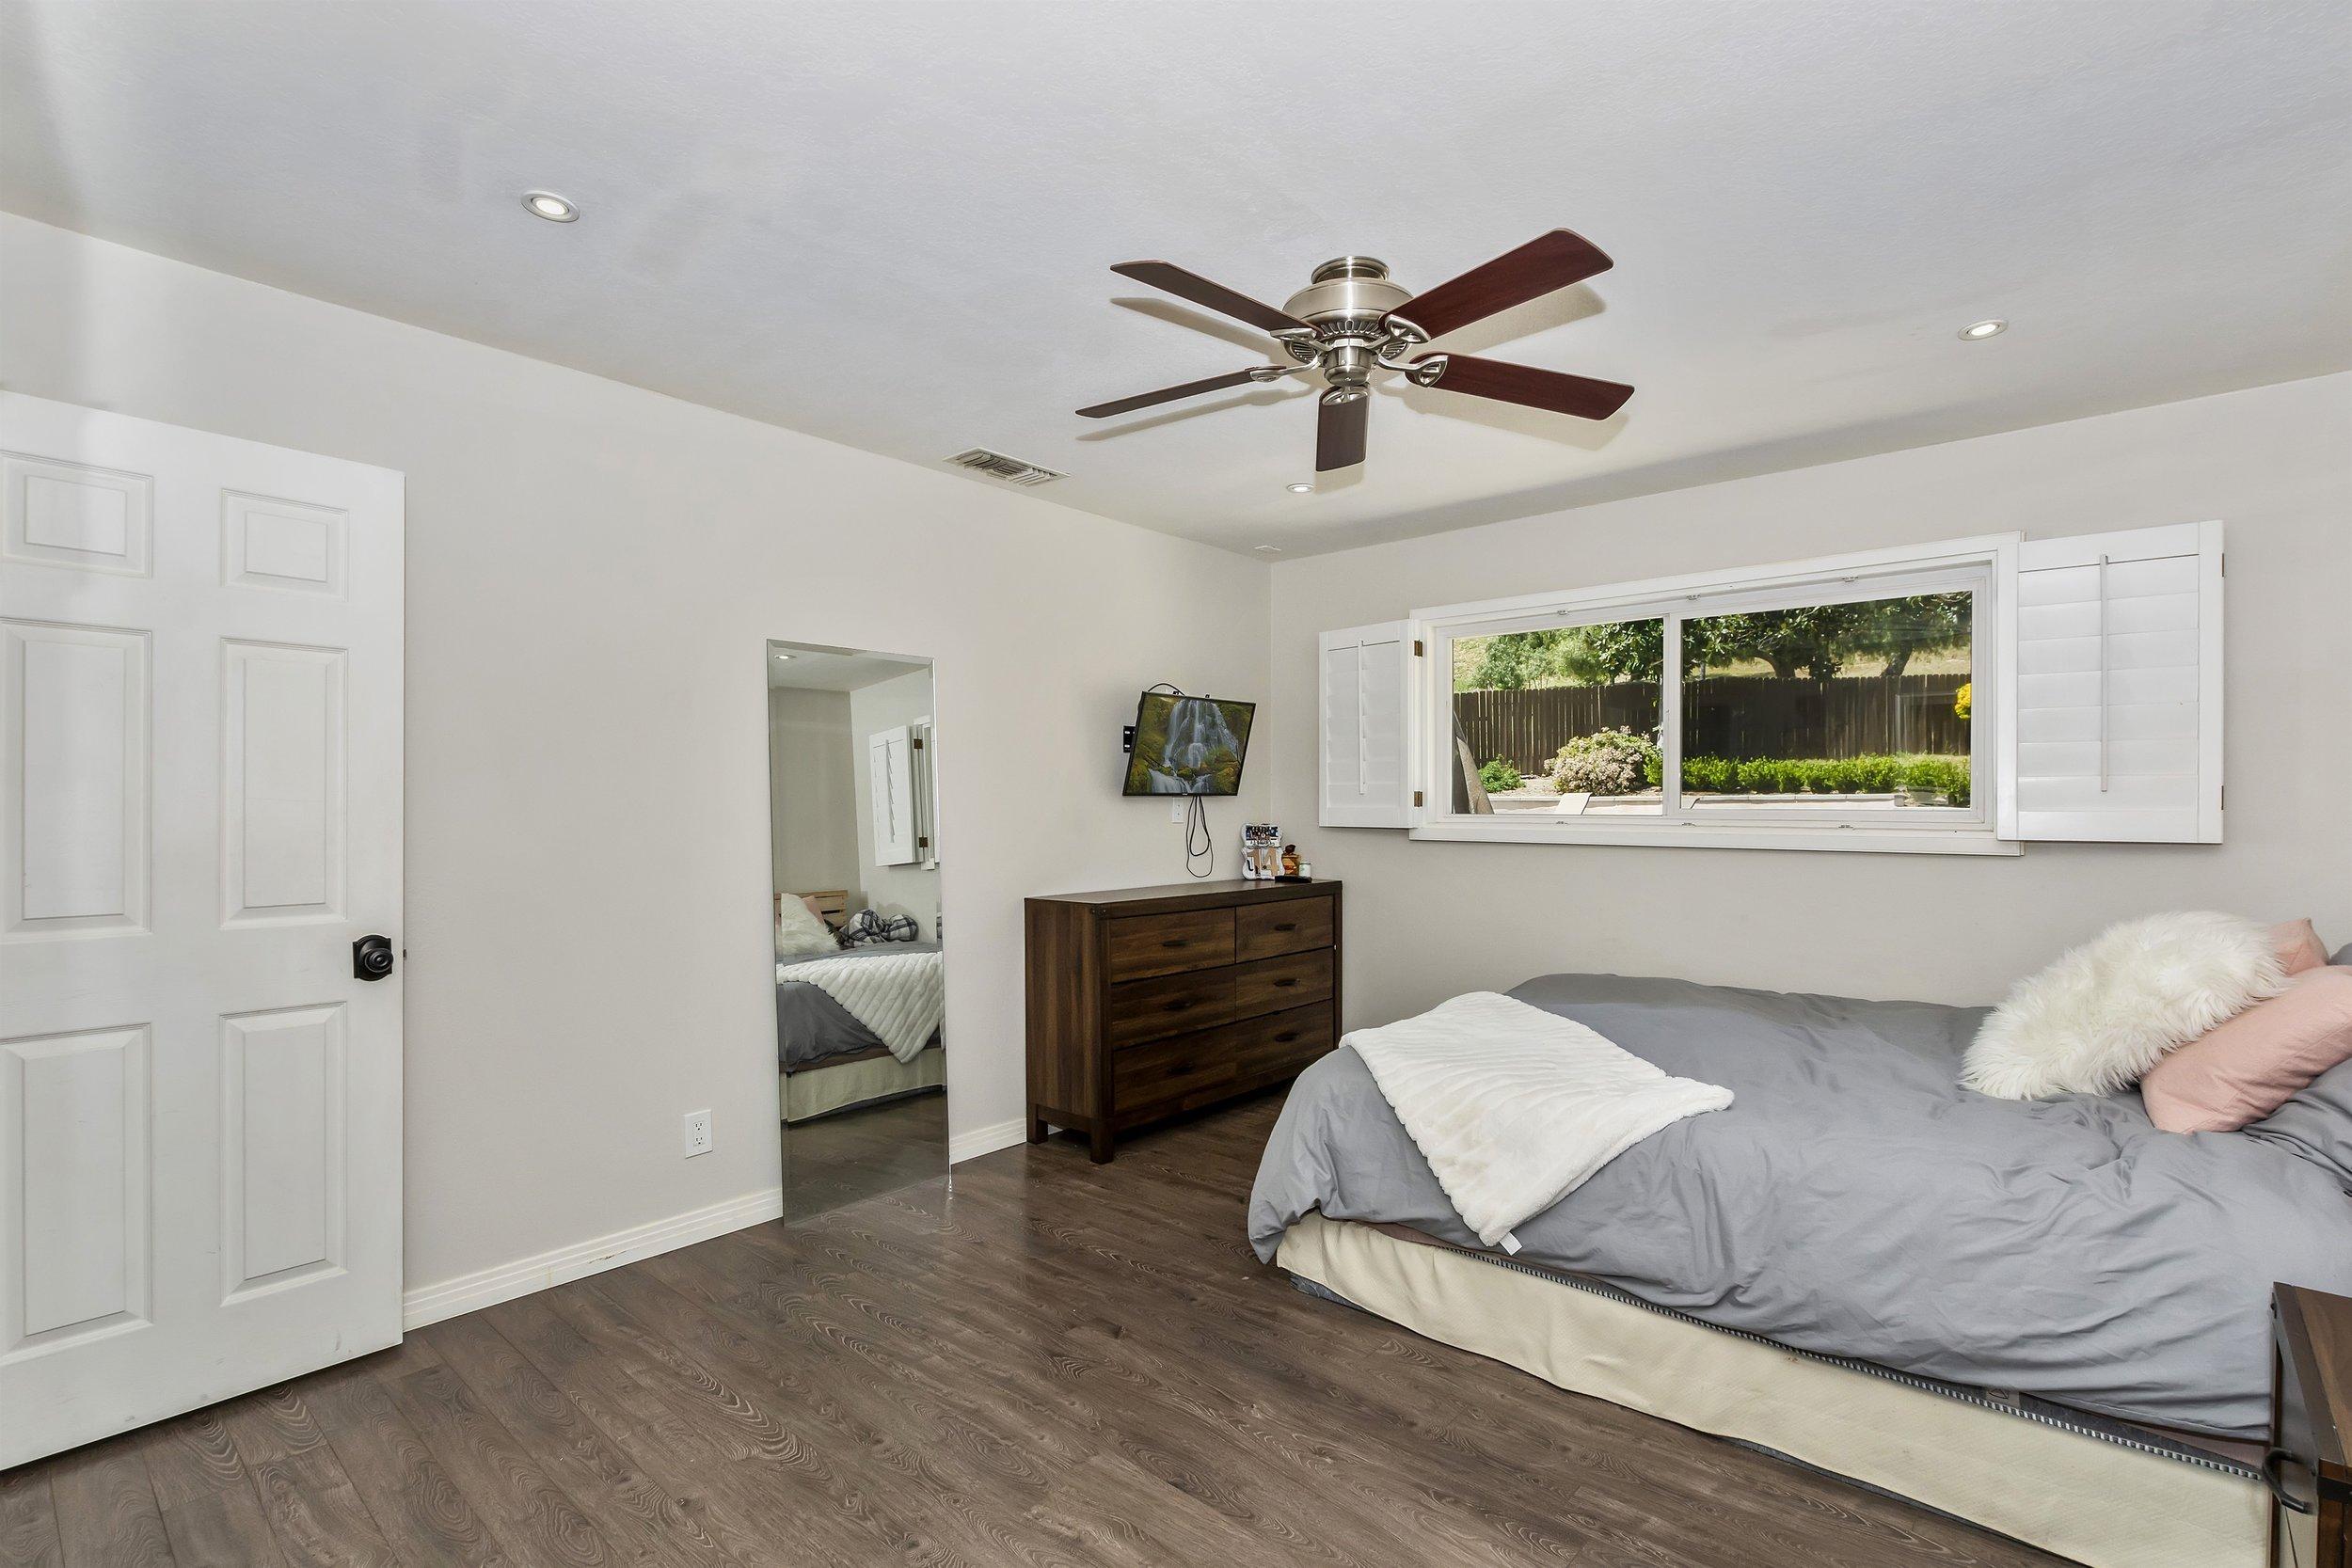 031_Bedroom.jpg